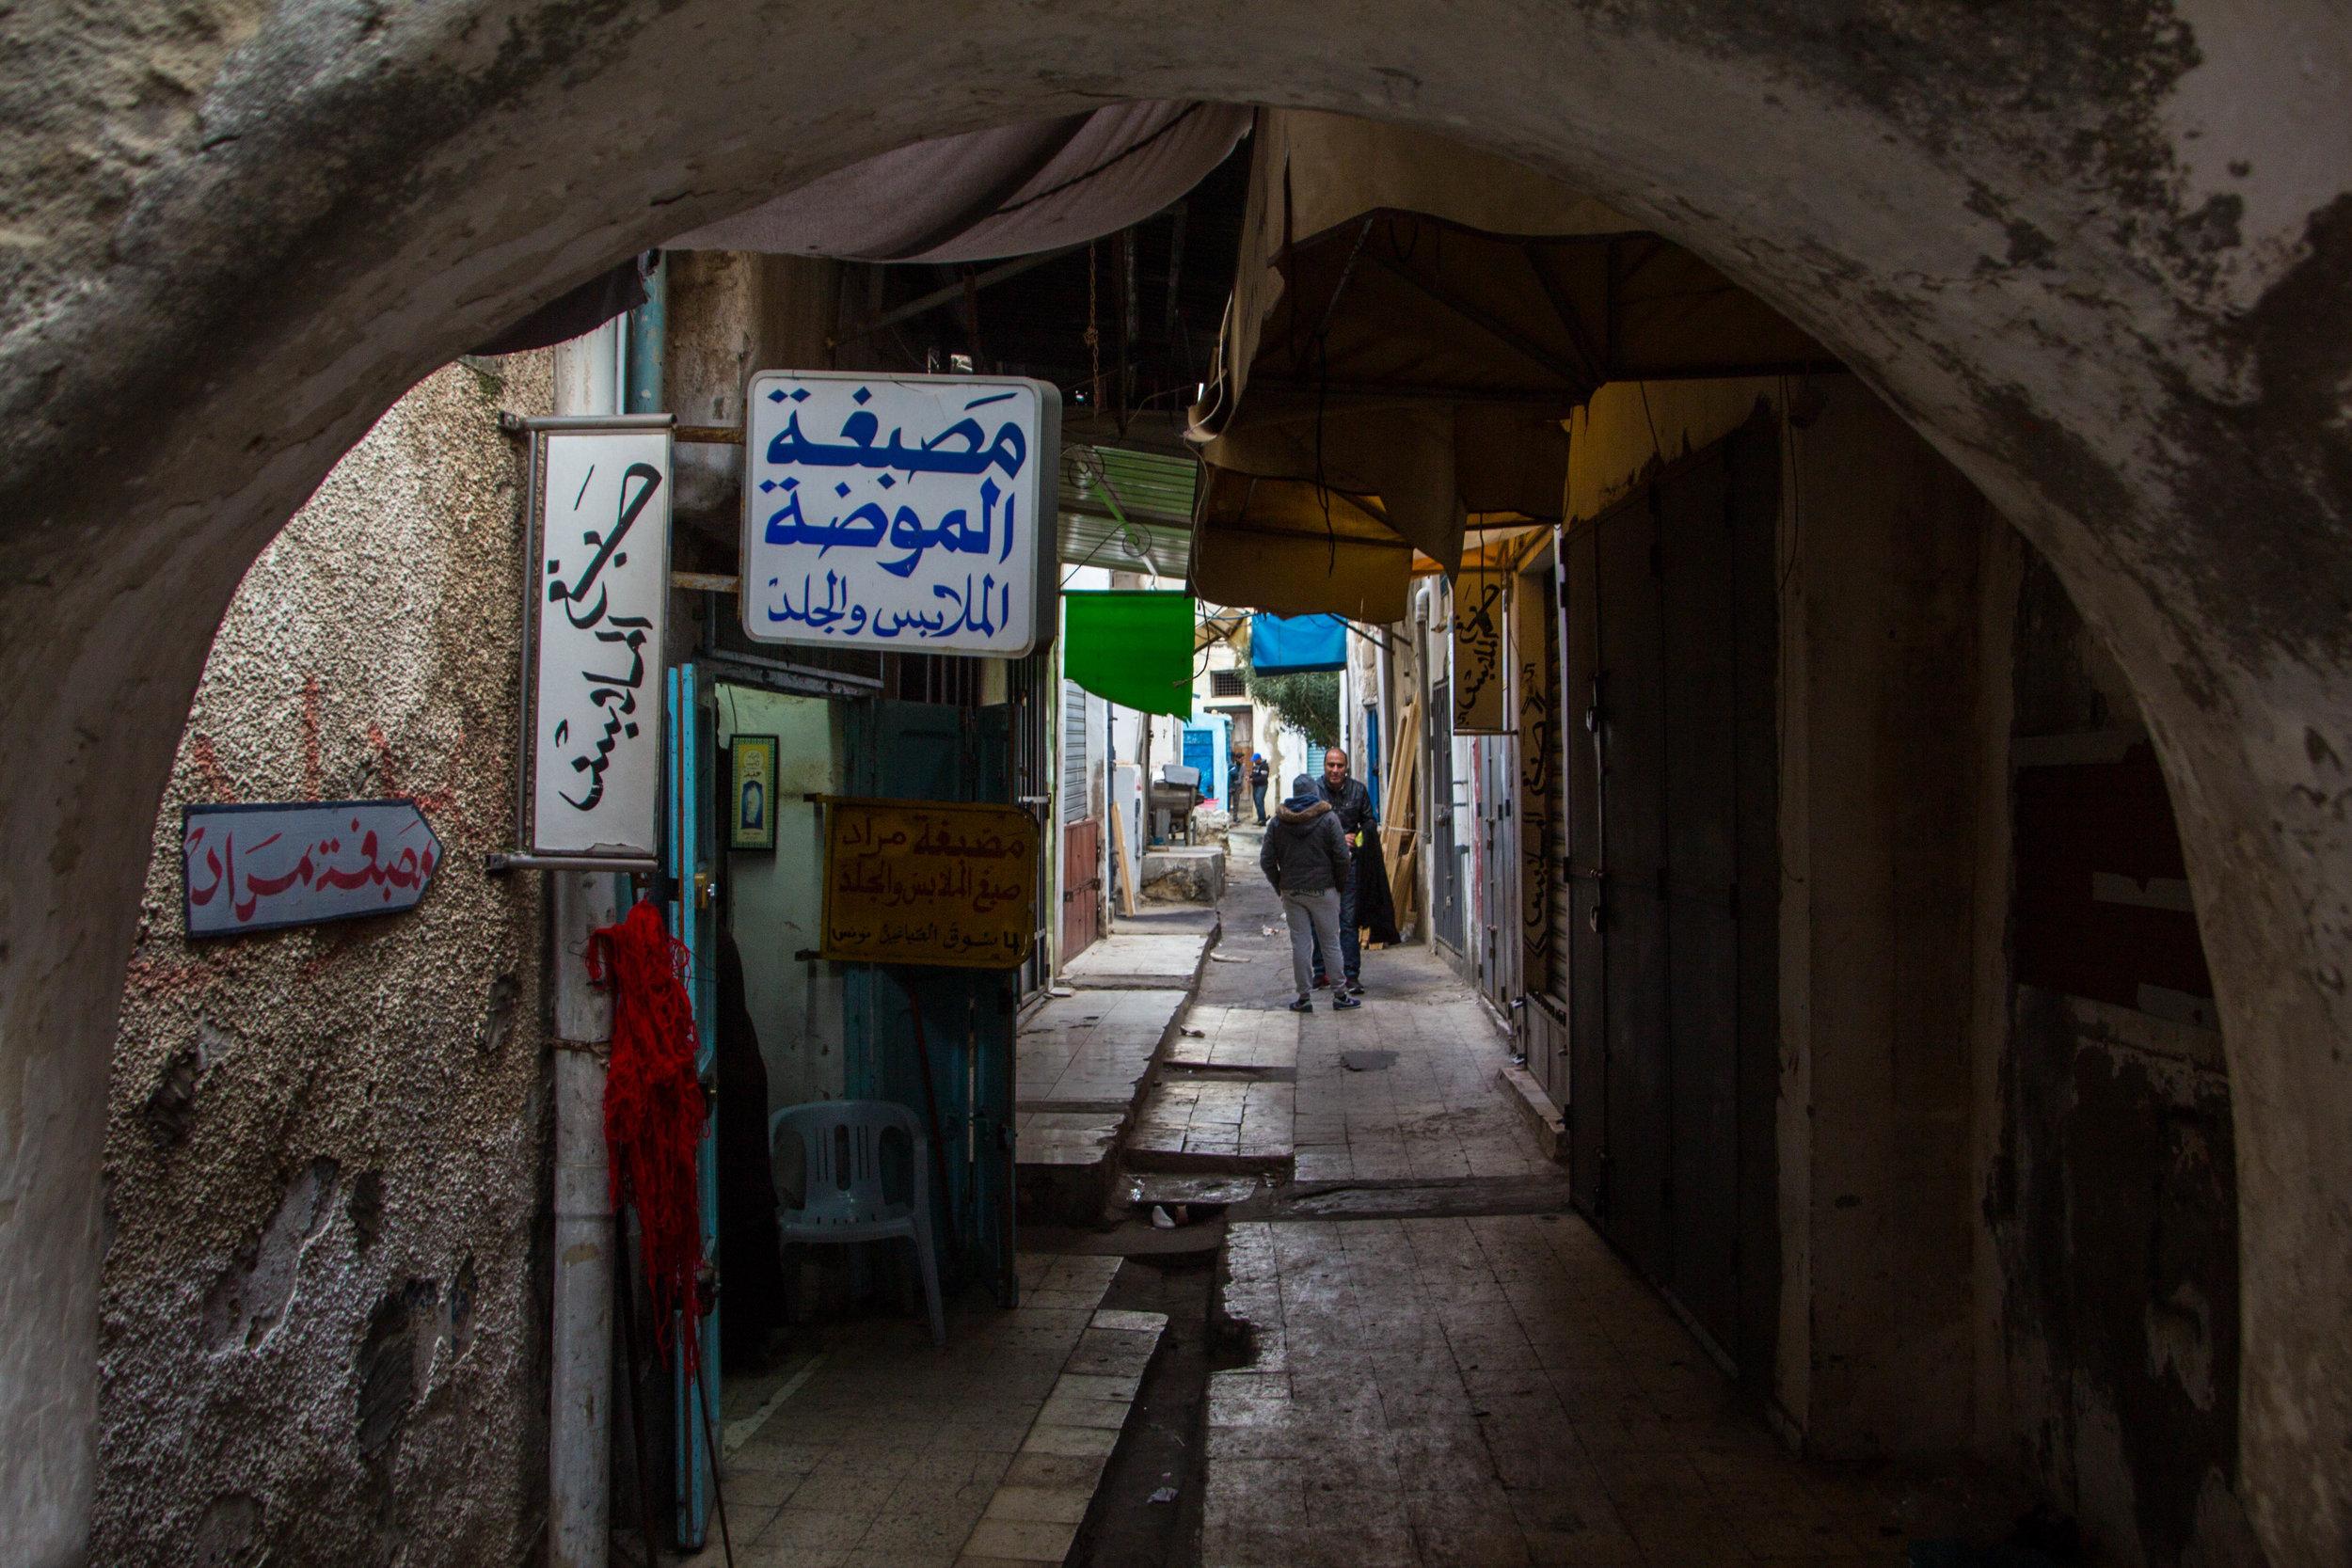 medina-photography-tunis-tunisia-62.jpg